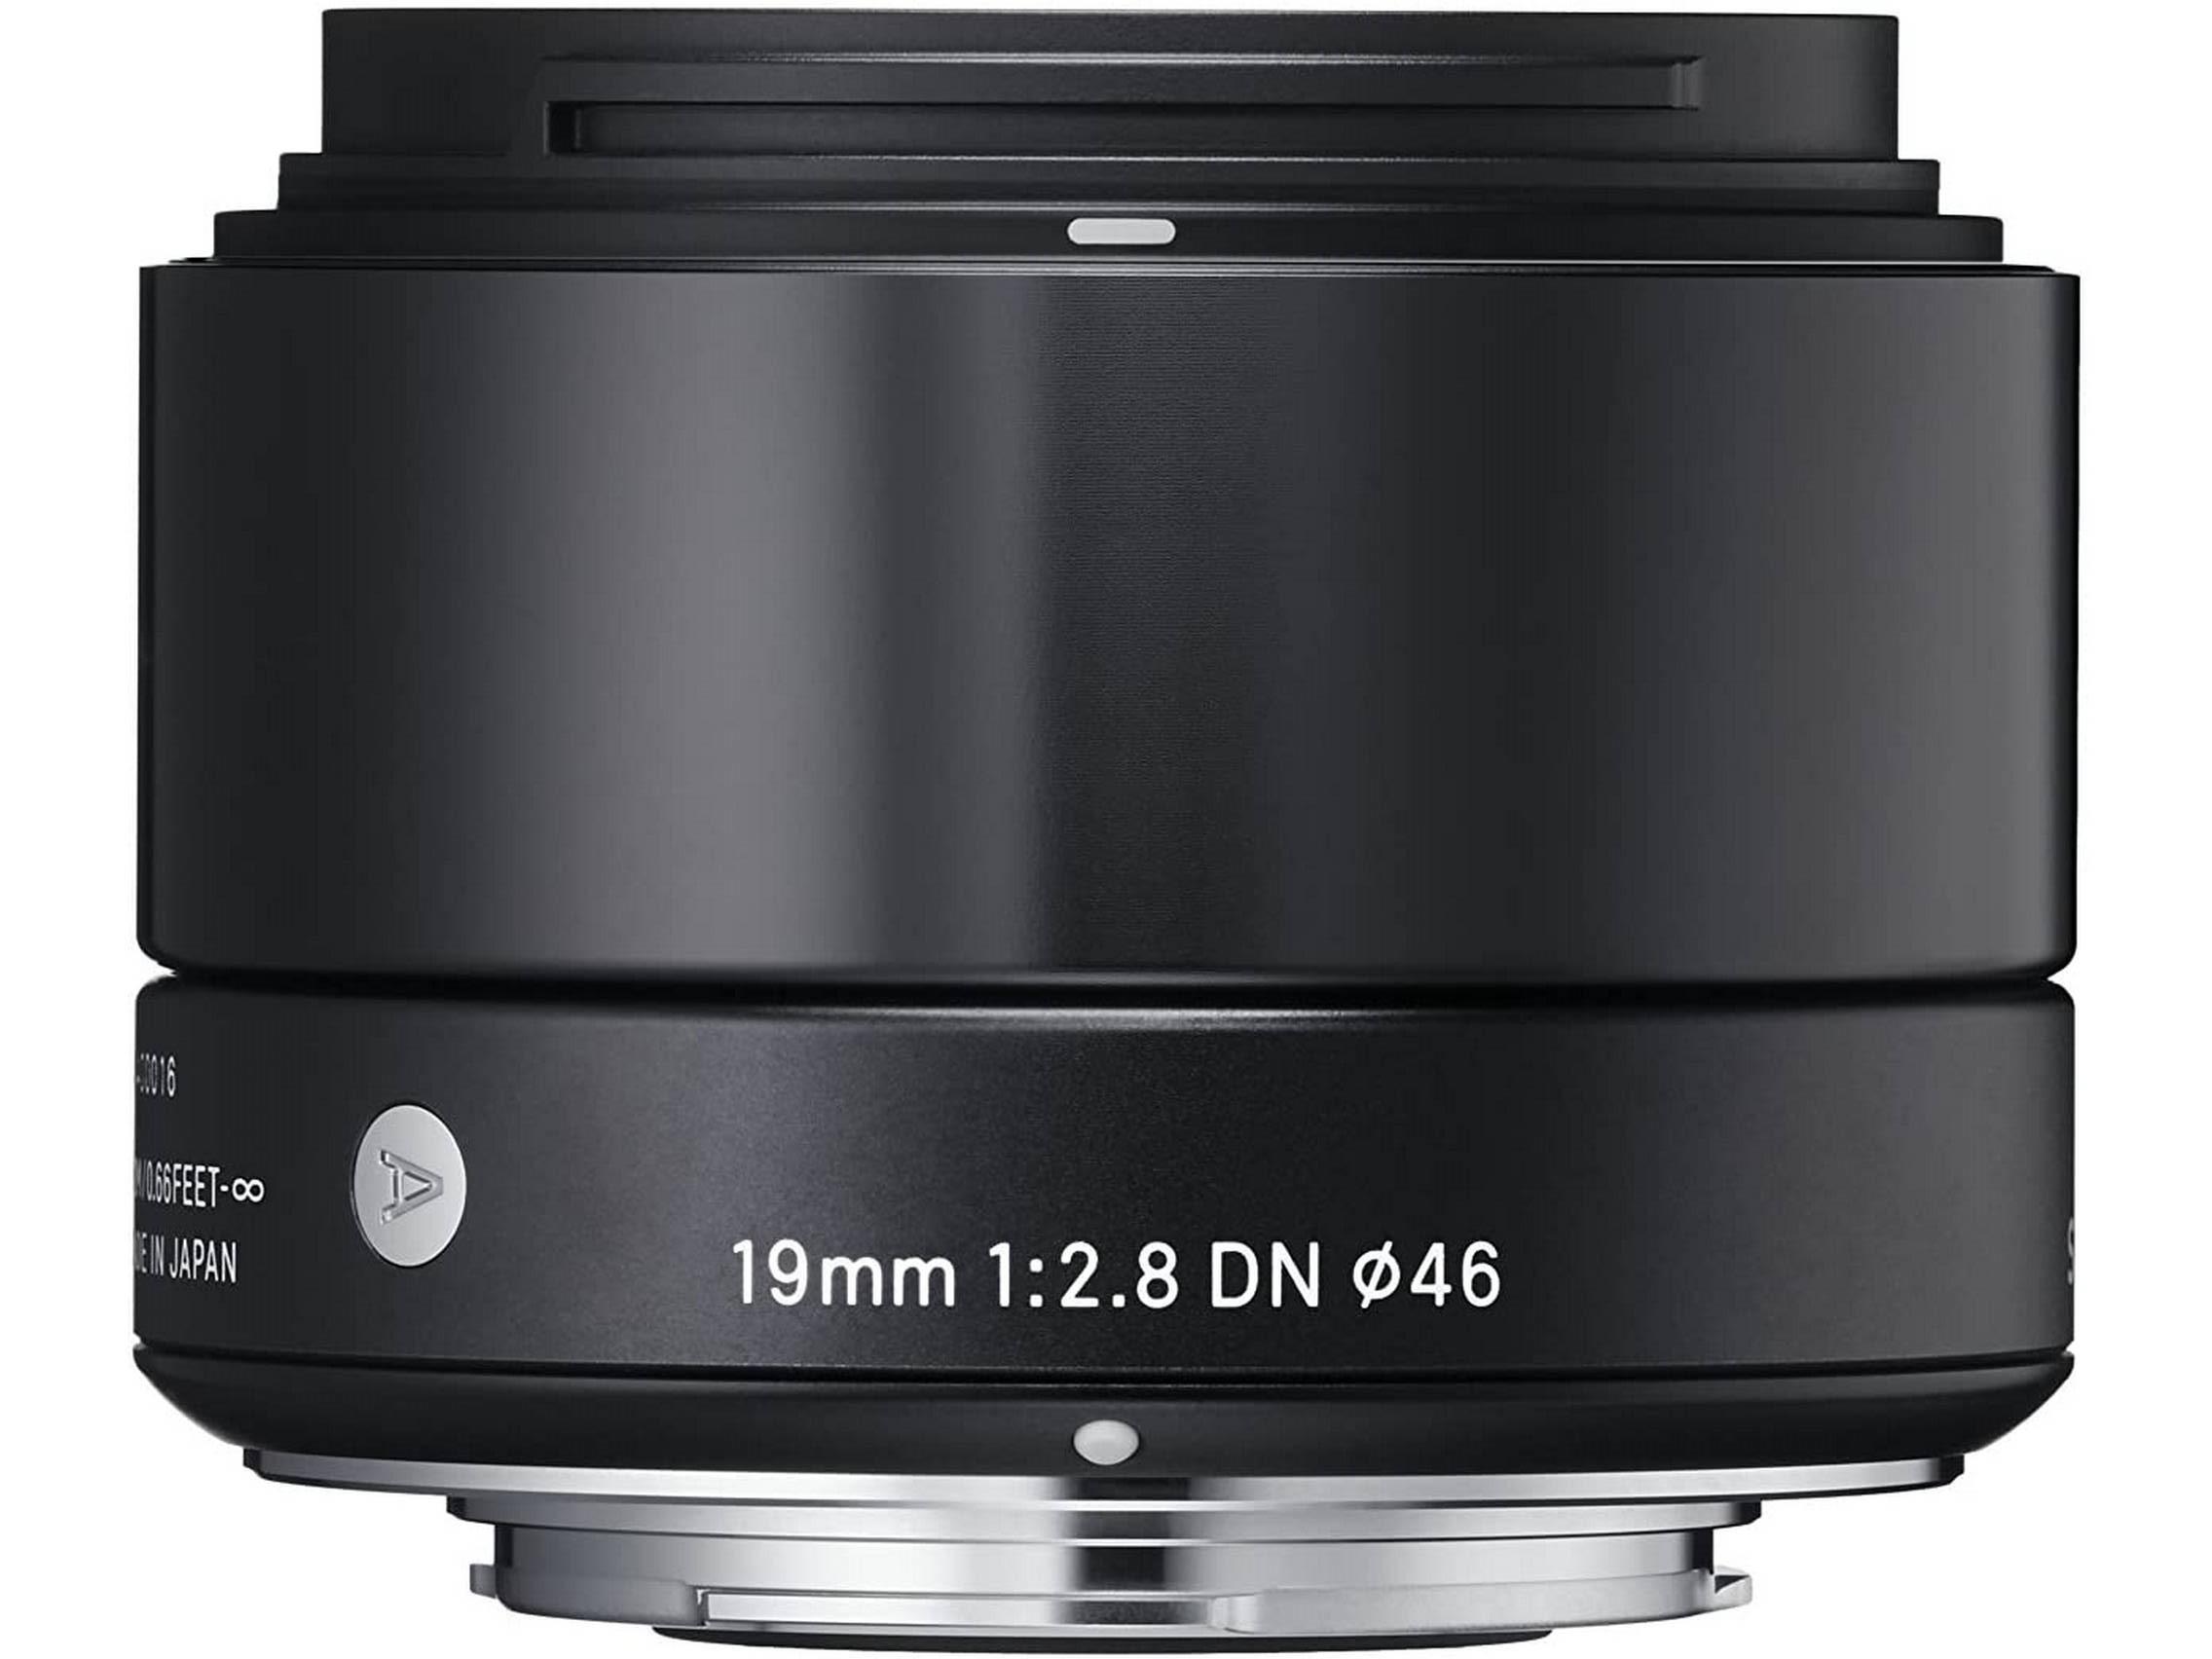 Sigma 19mm 1:2.8 DN A (ART)